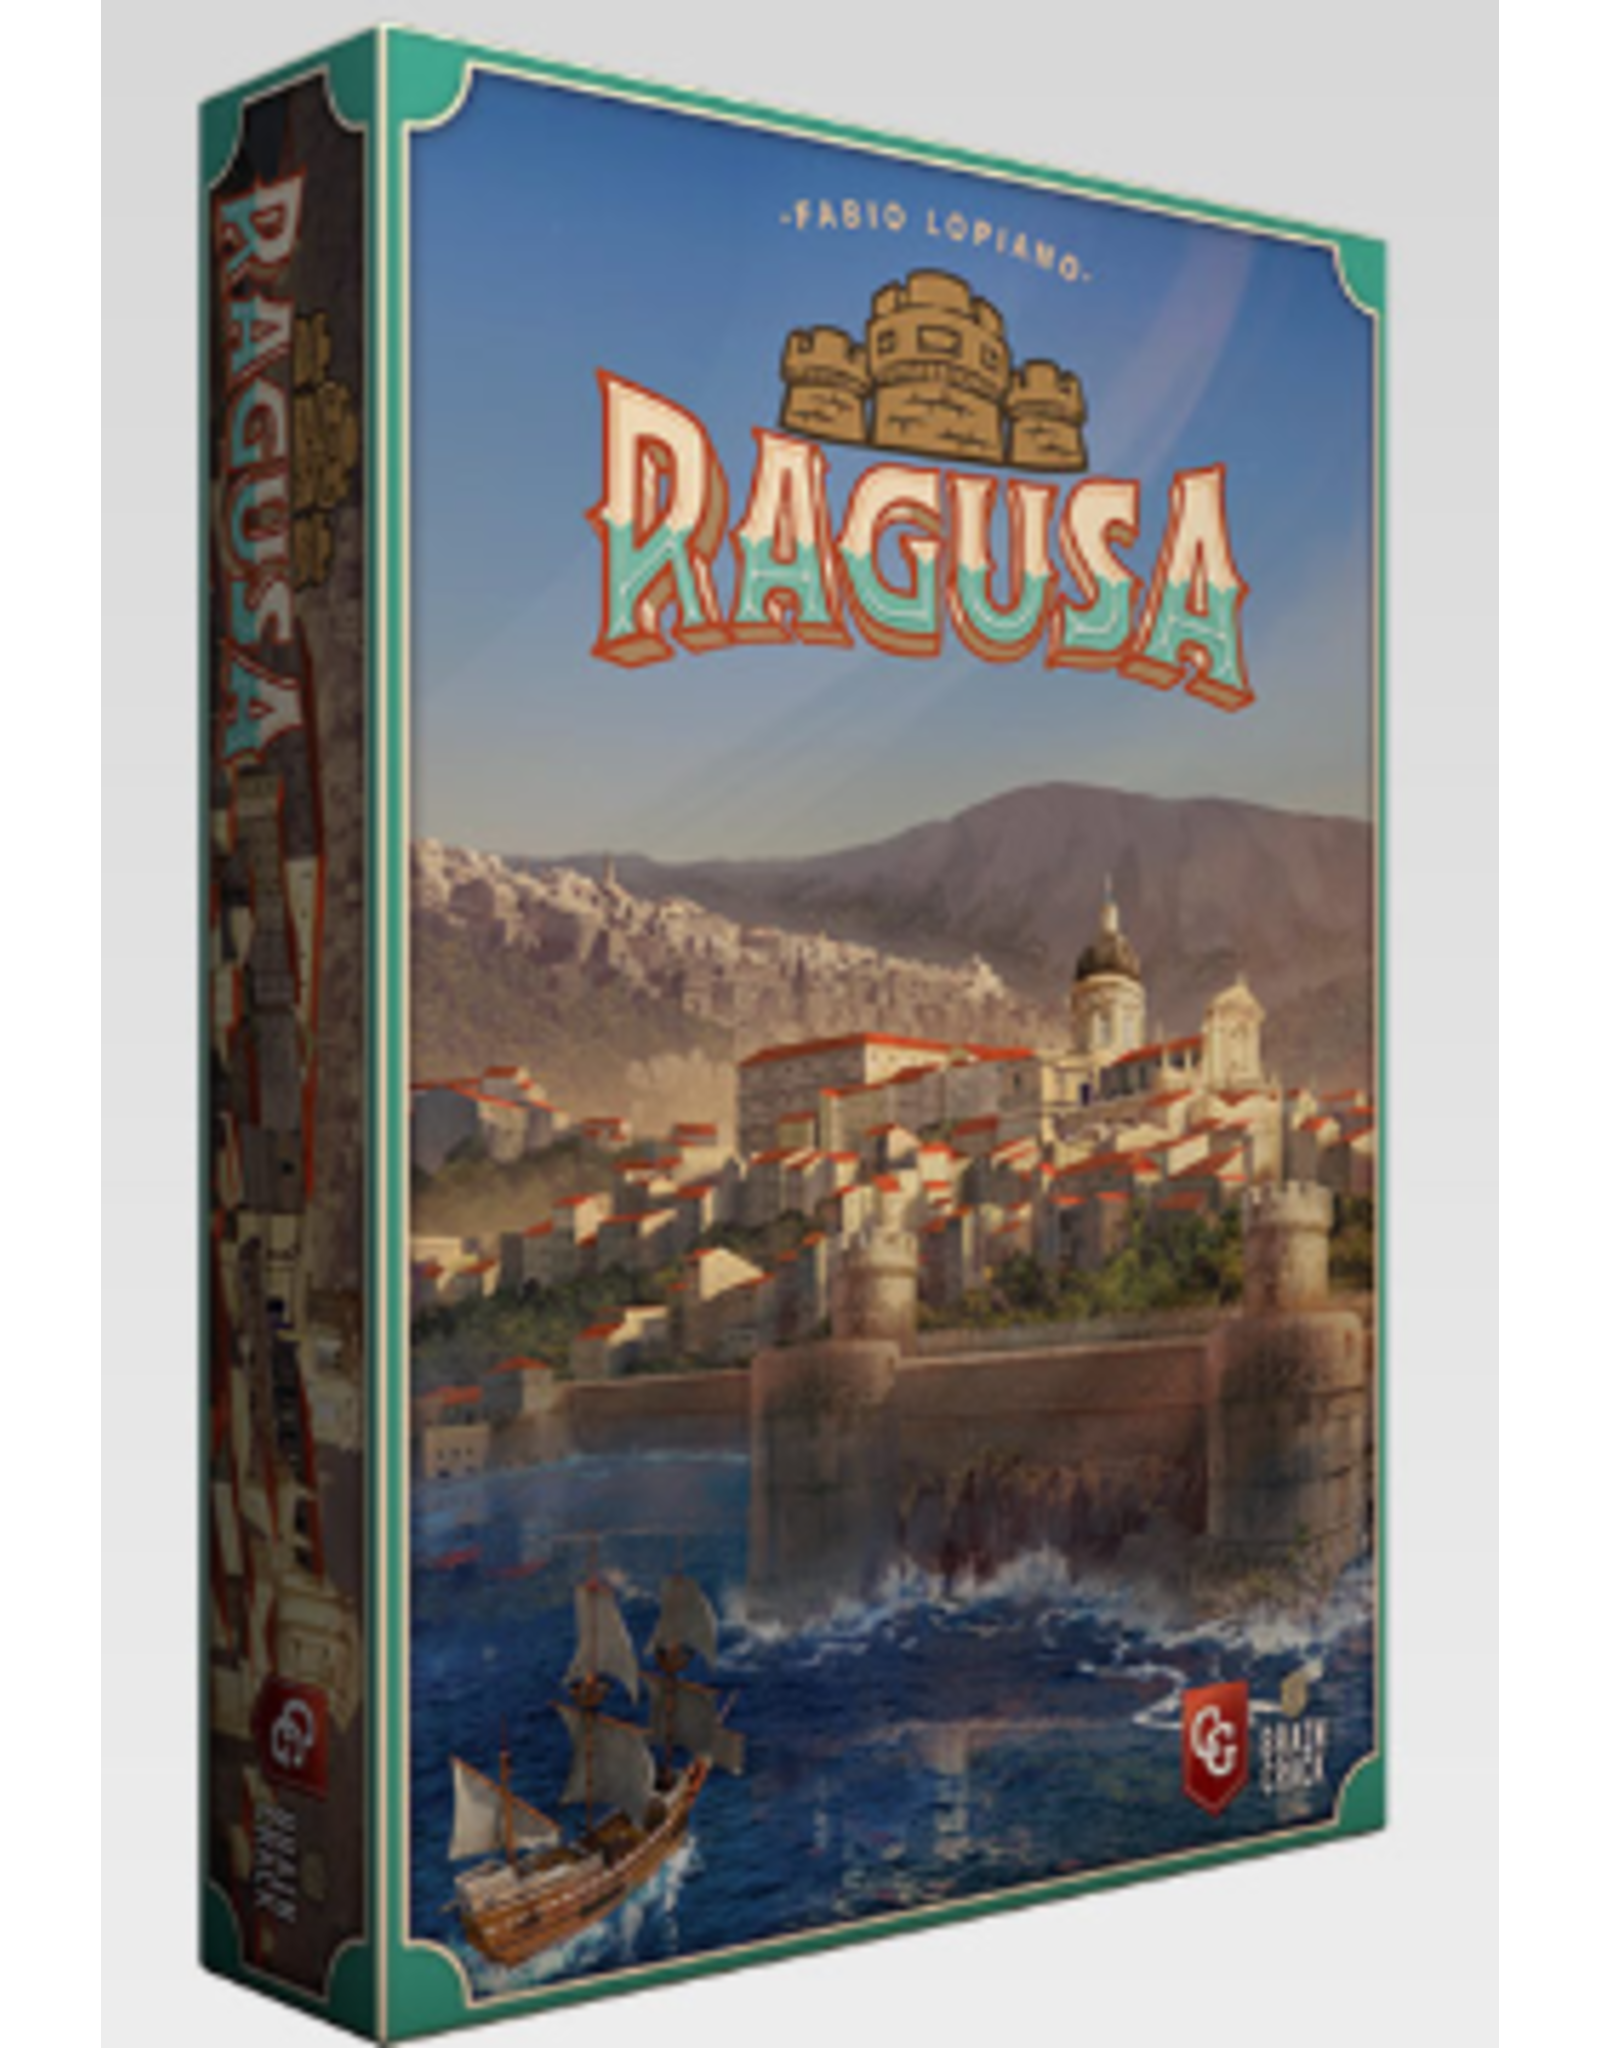 Capstone Ragusa